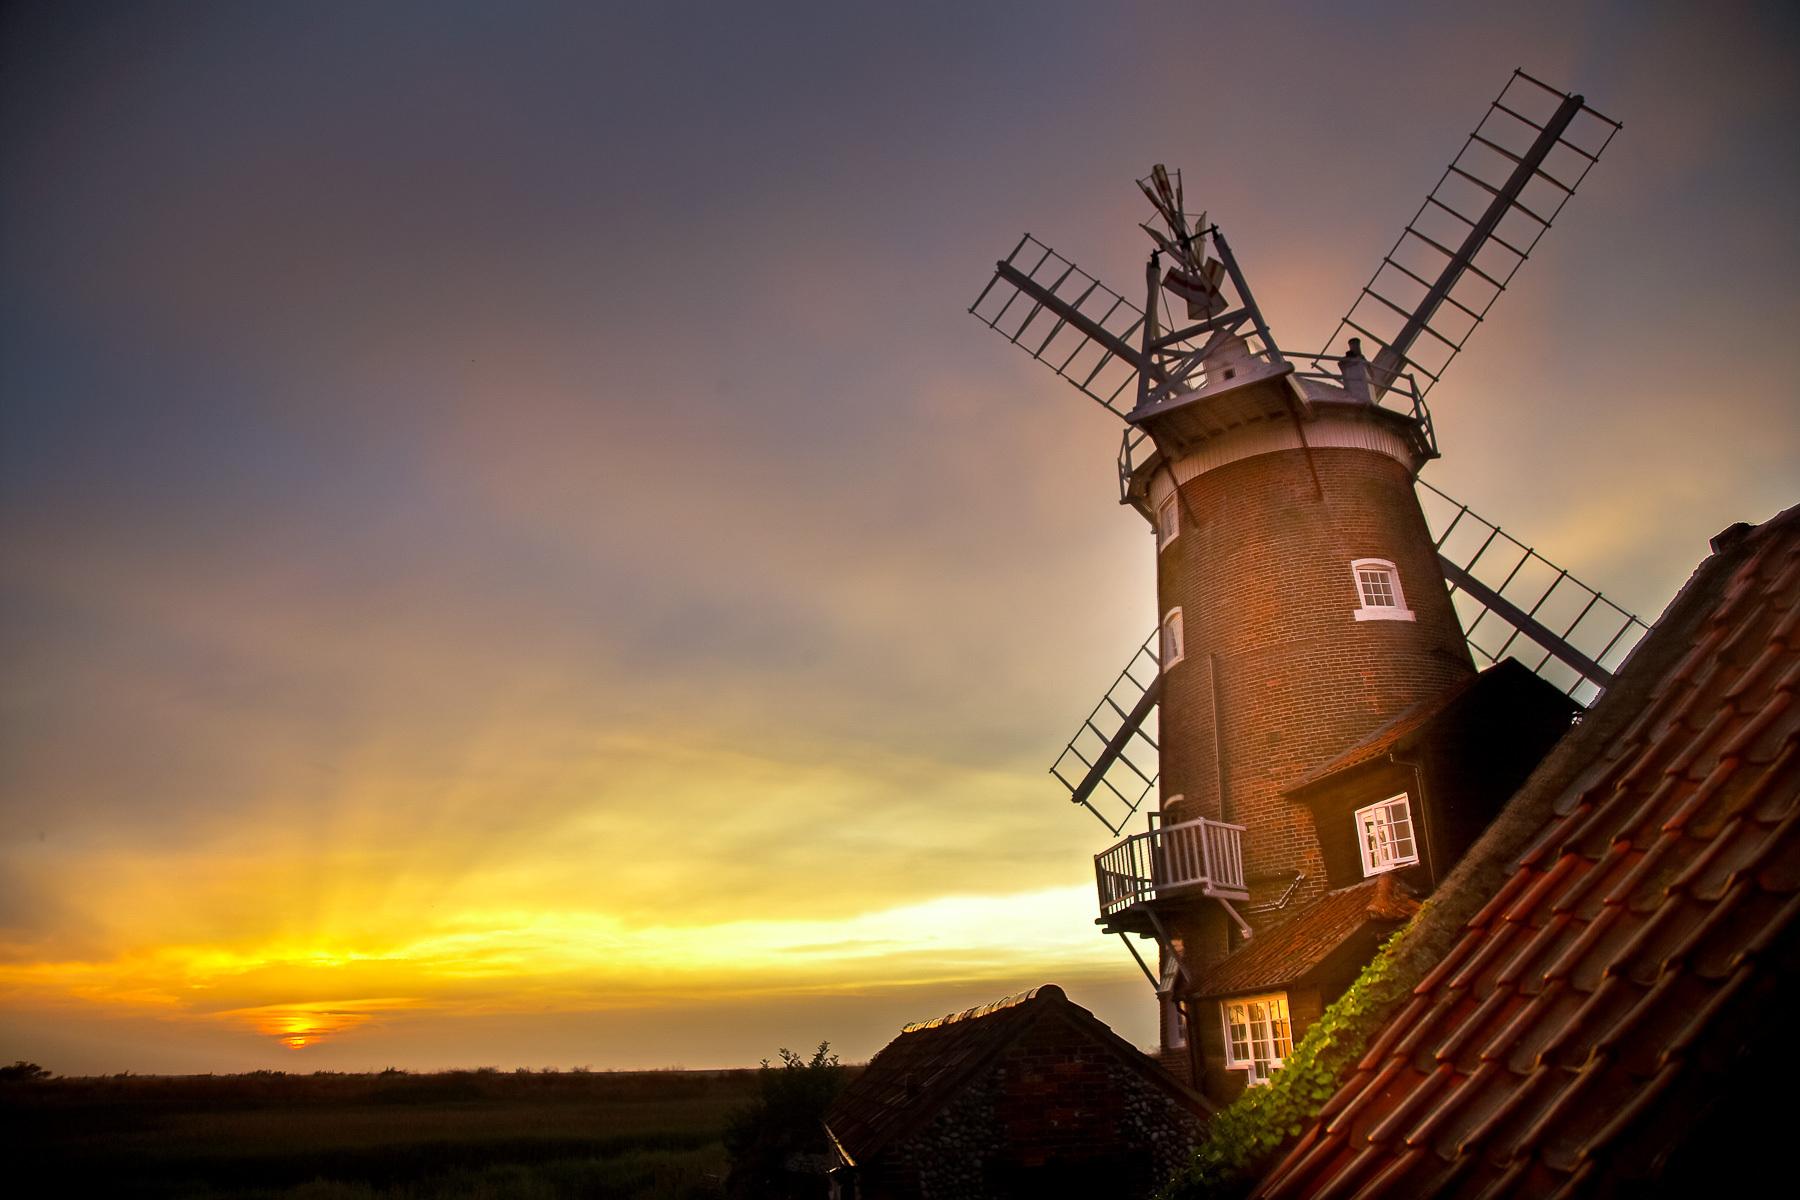 1cley_next_the_sea___windmill_no__1.jpg